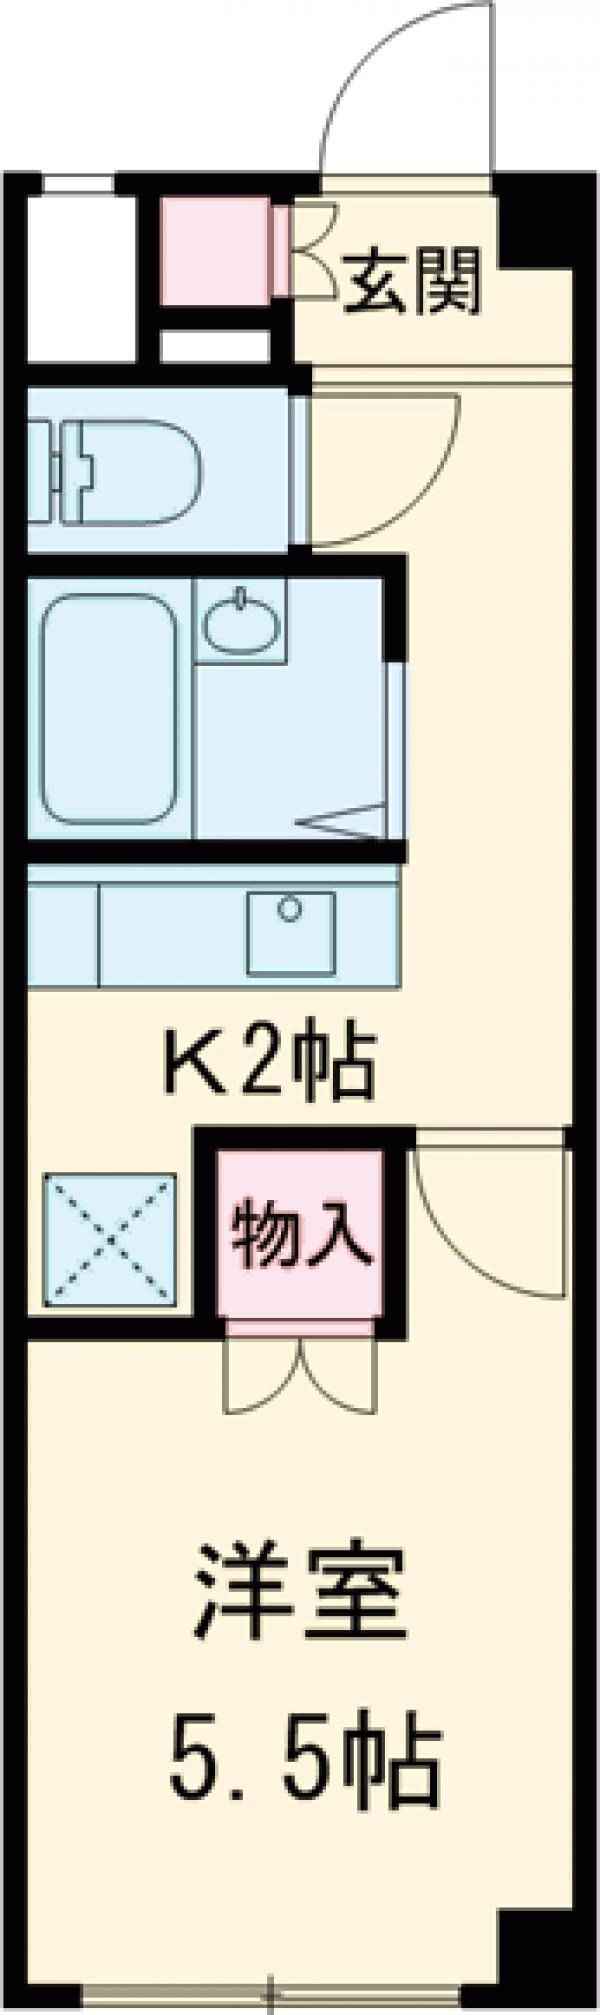 SKK-Ⅷ・302号室の間取り